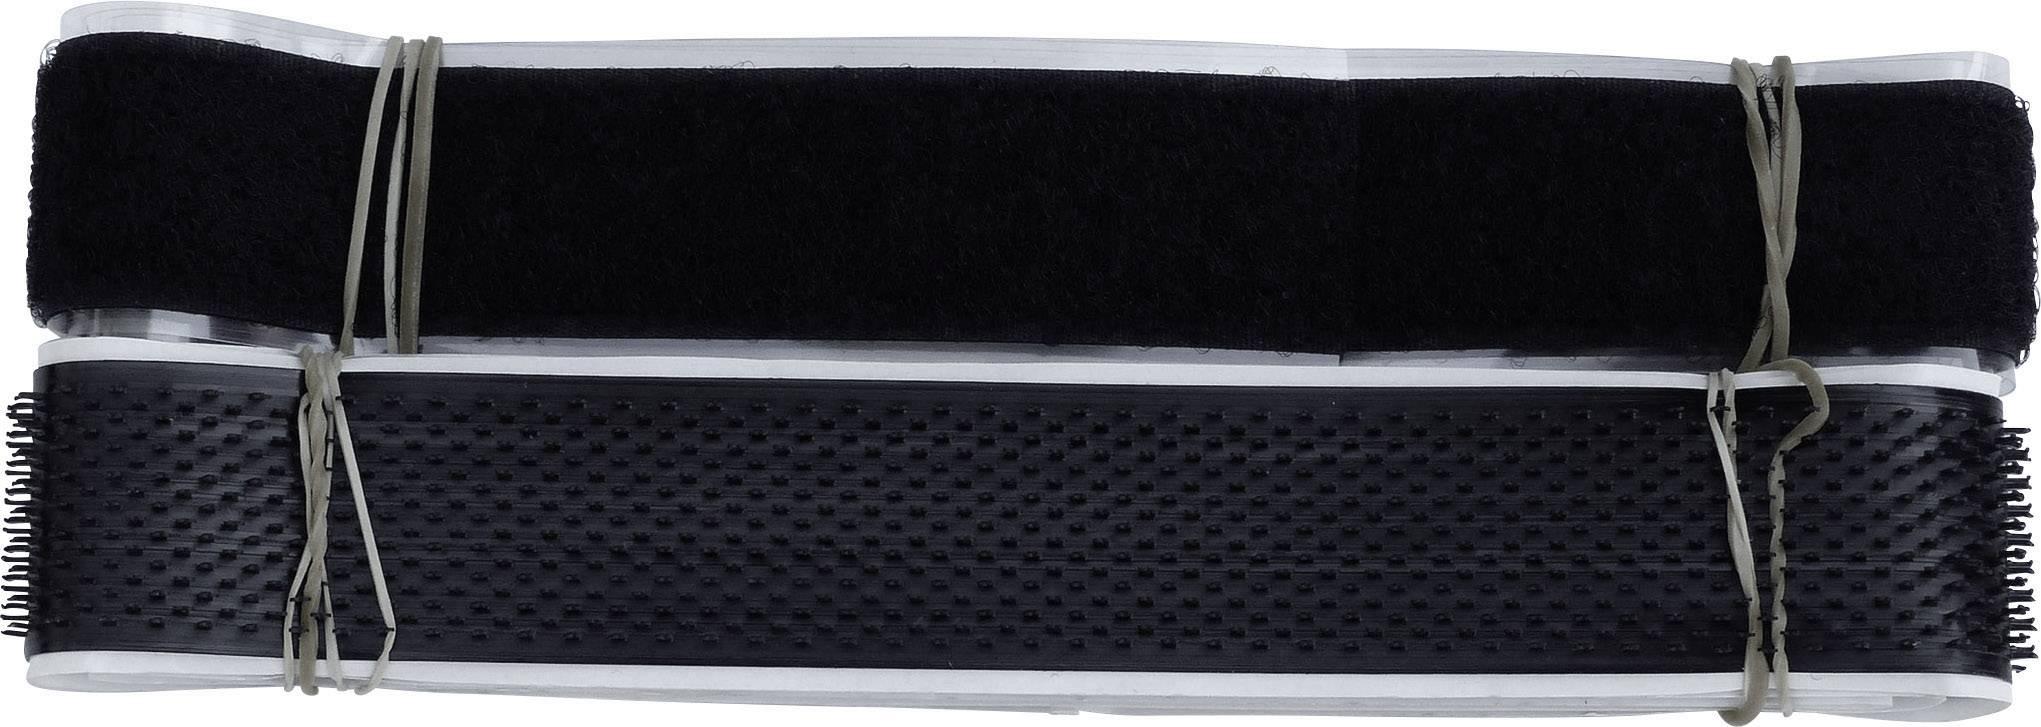 Lepiaci pásik so suchým zipsom TRU COMPONENTS 905-MVA8-Bag, (d x š) 1000 mm x 25 mm, 1 ks